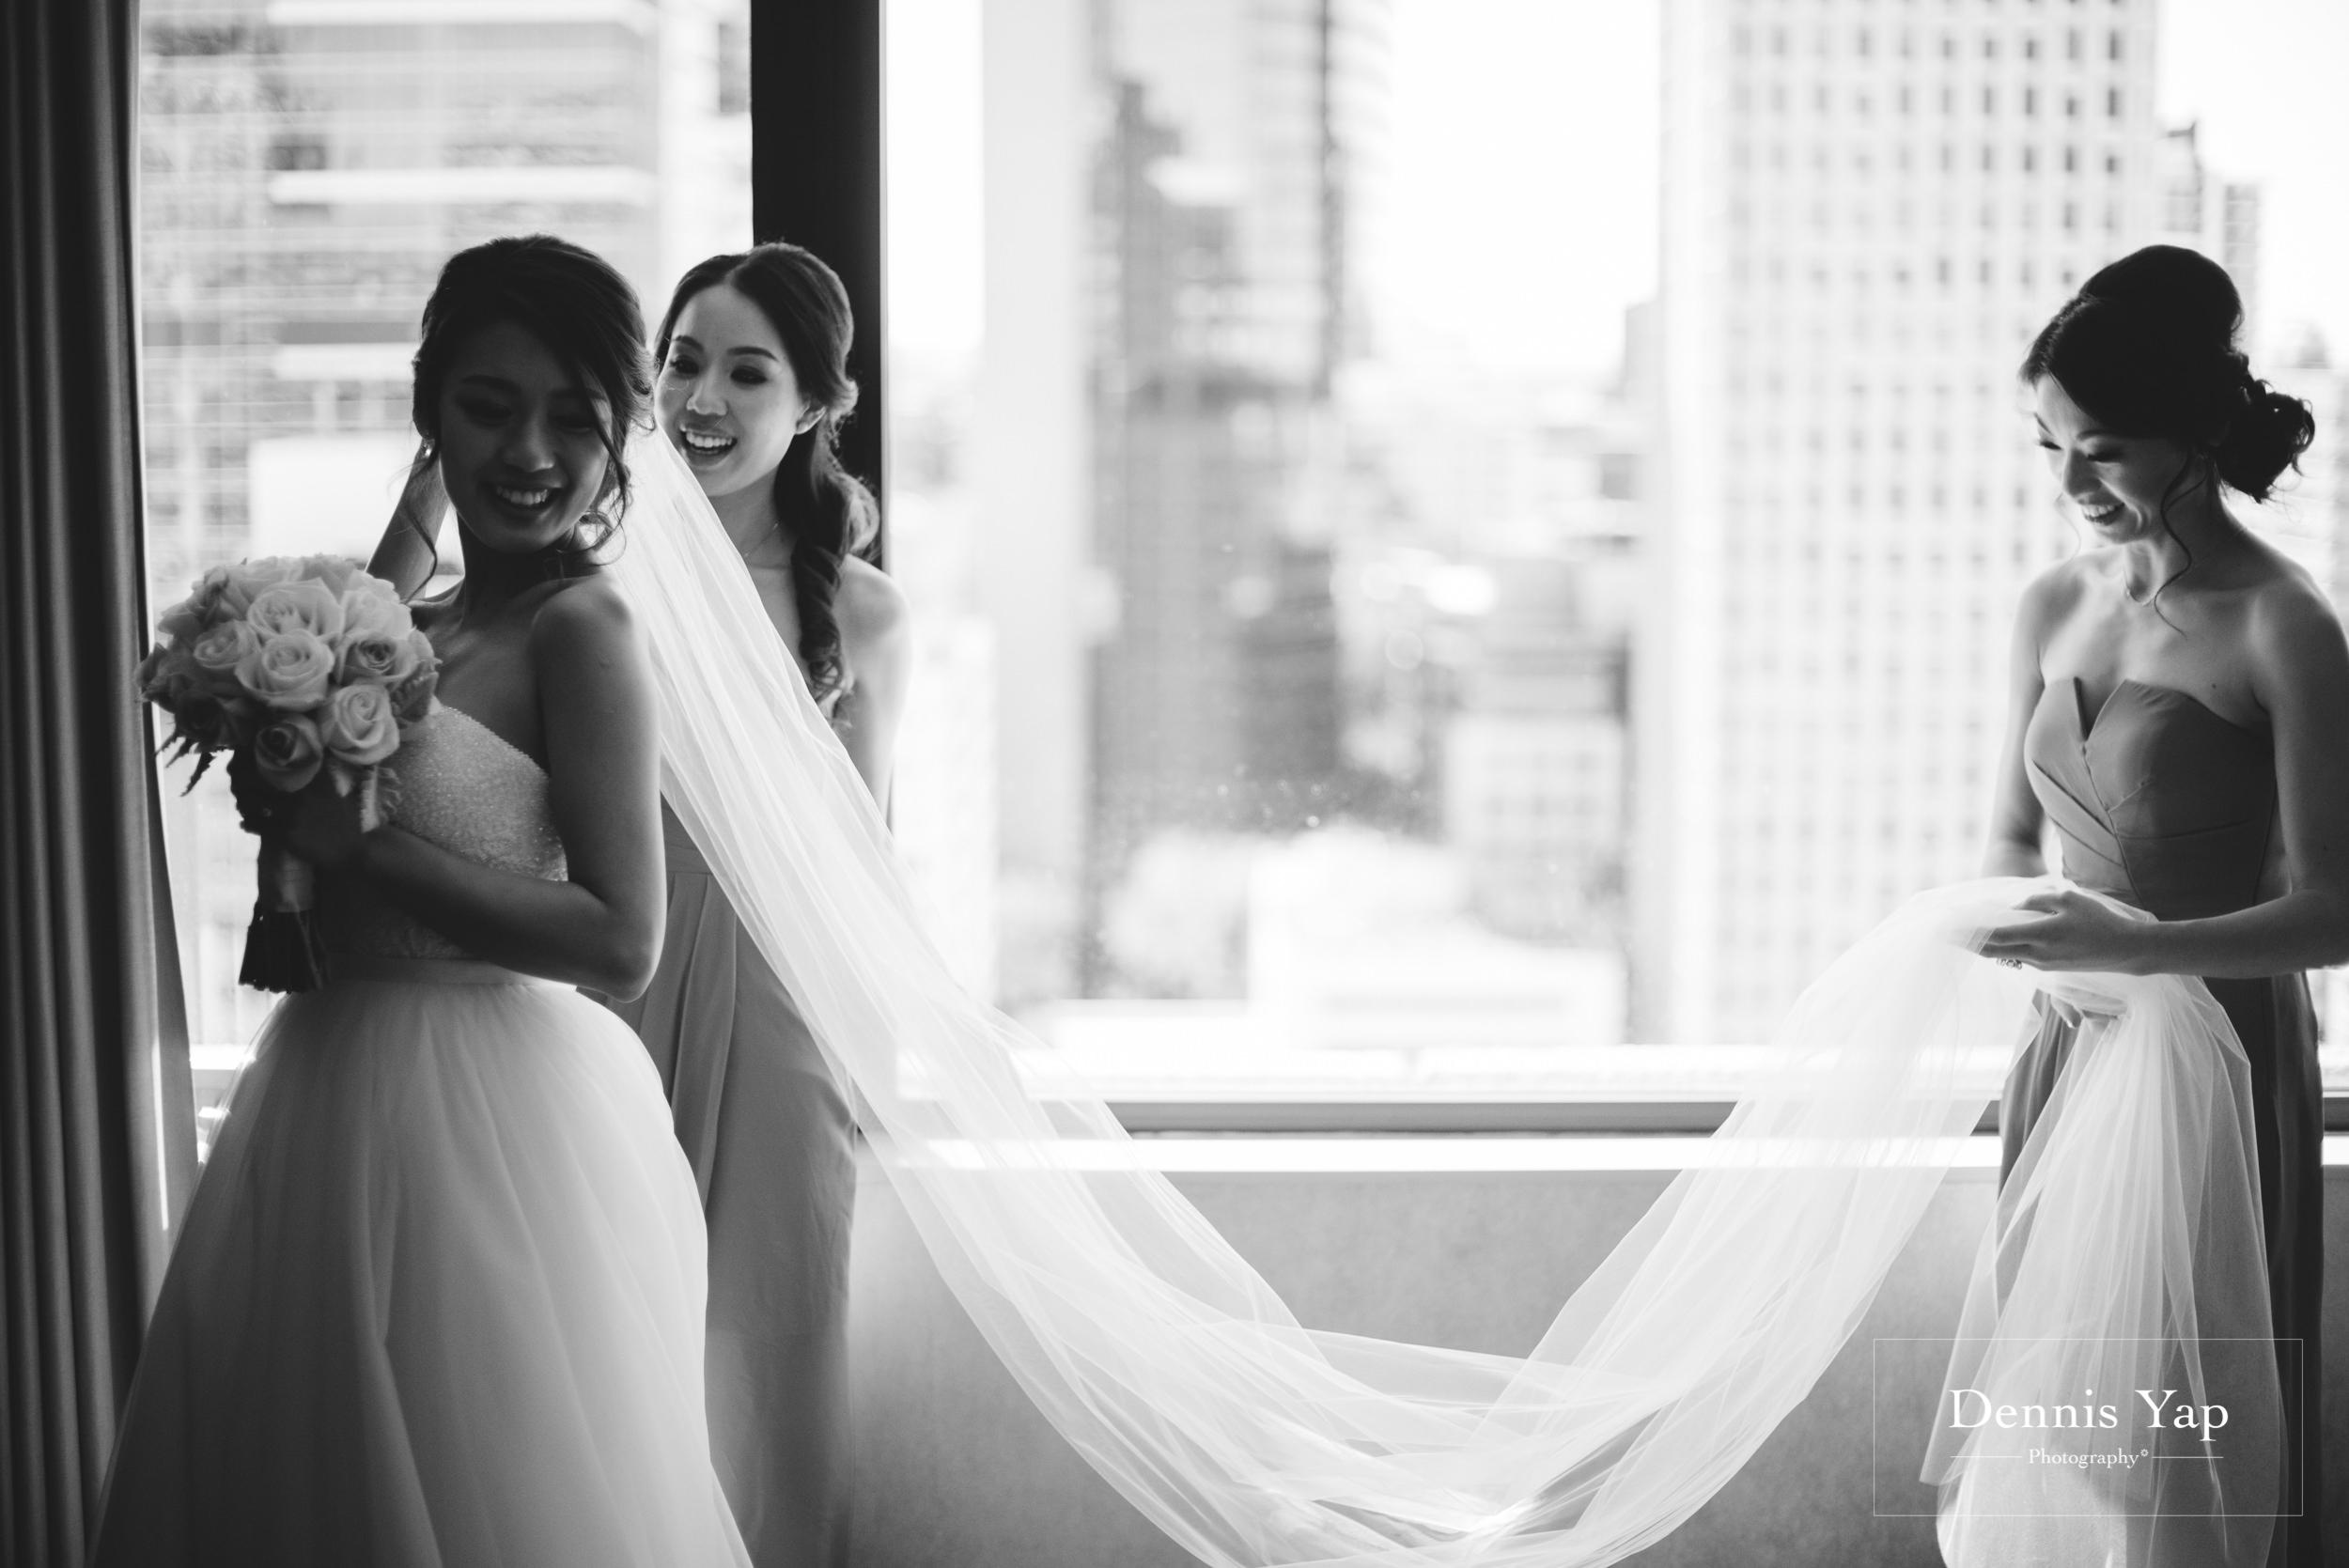 thang veng vietnamese wedding brisbane dennis yap photography malaysia wedding photographer-15.jpg